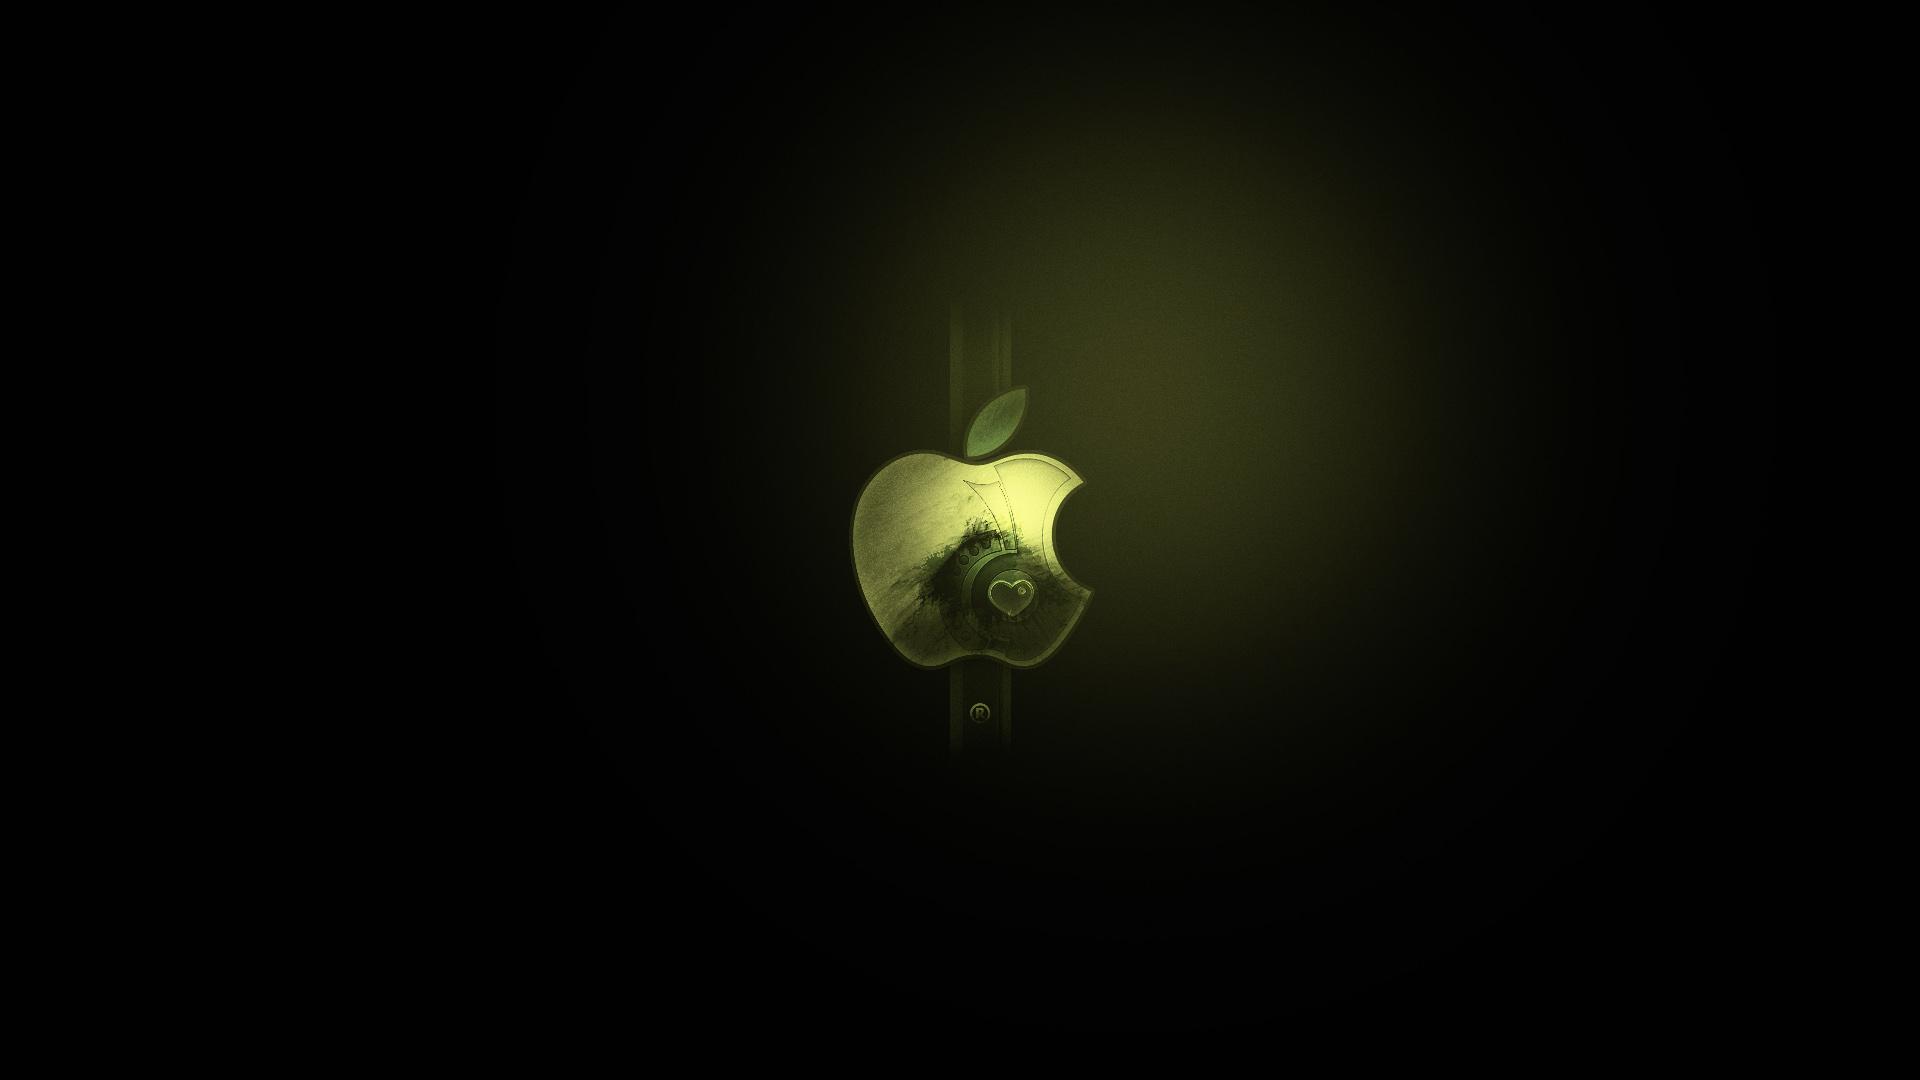 900 Wallpaper Apple Cross  Paling Baru